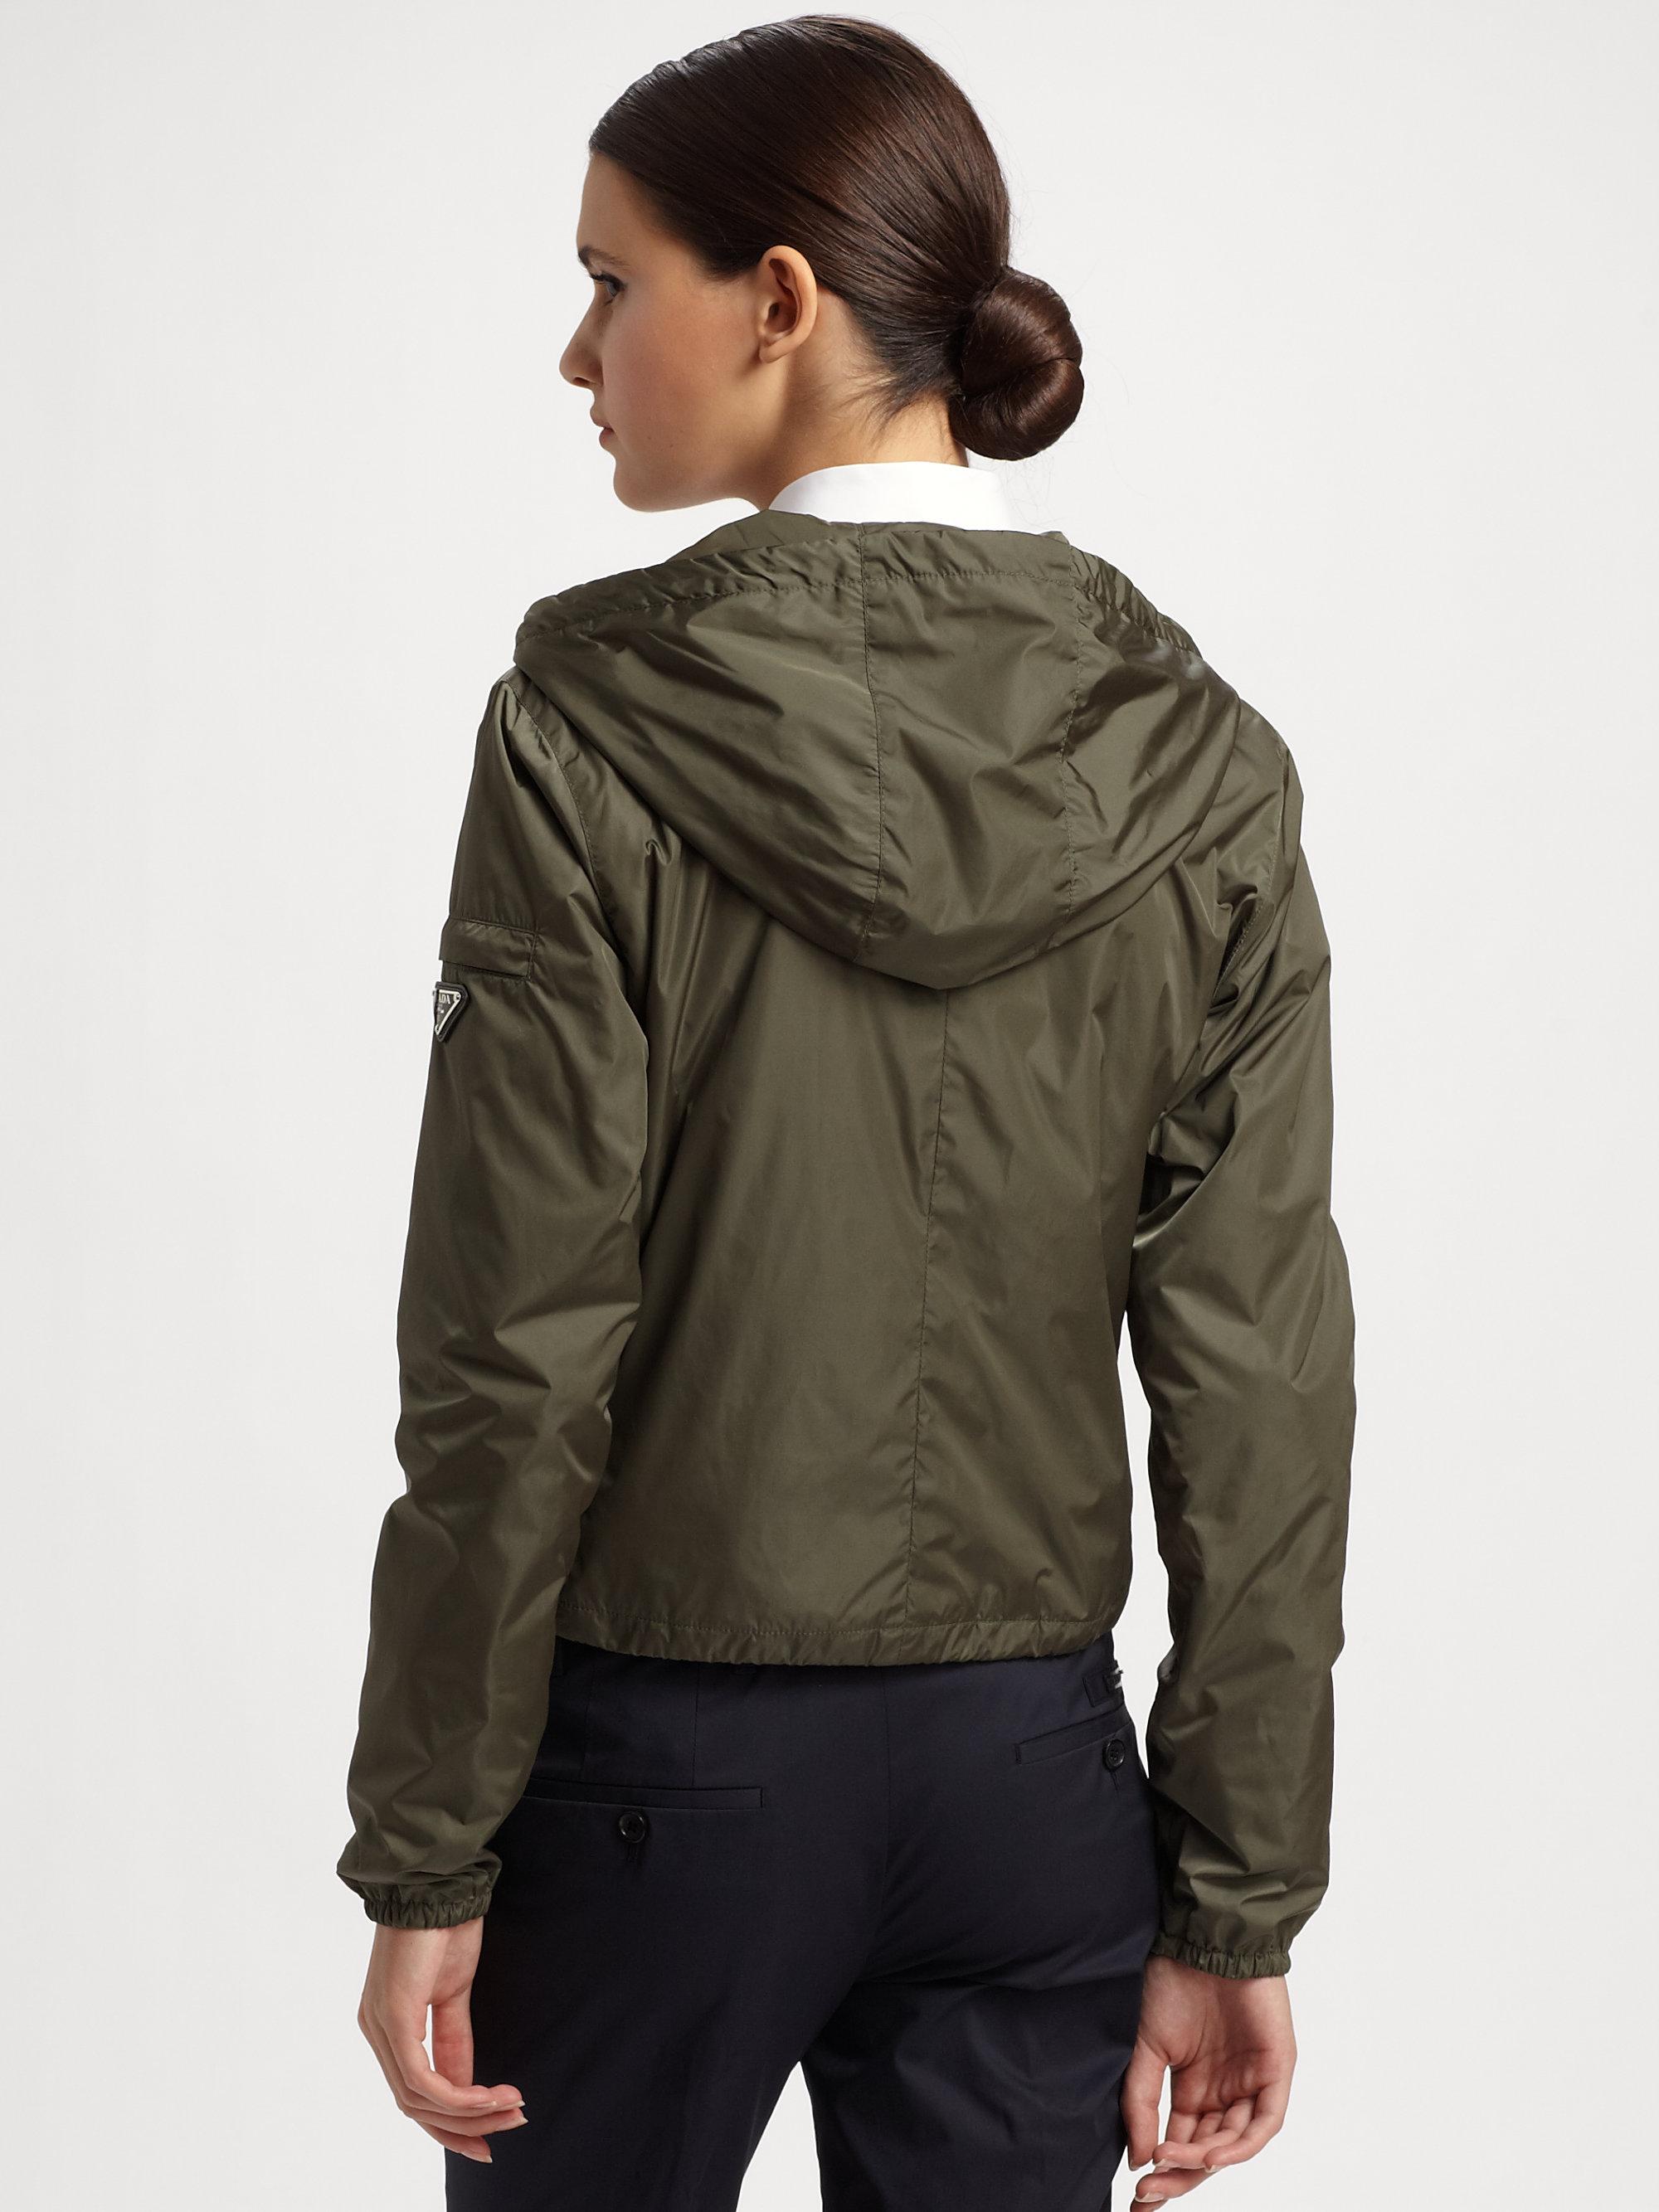 Prada zip up hooded jacket - Green 2018 New Low Price Cheap Price epWVqiZP